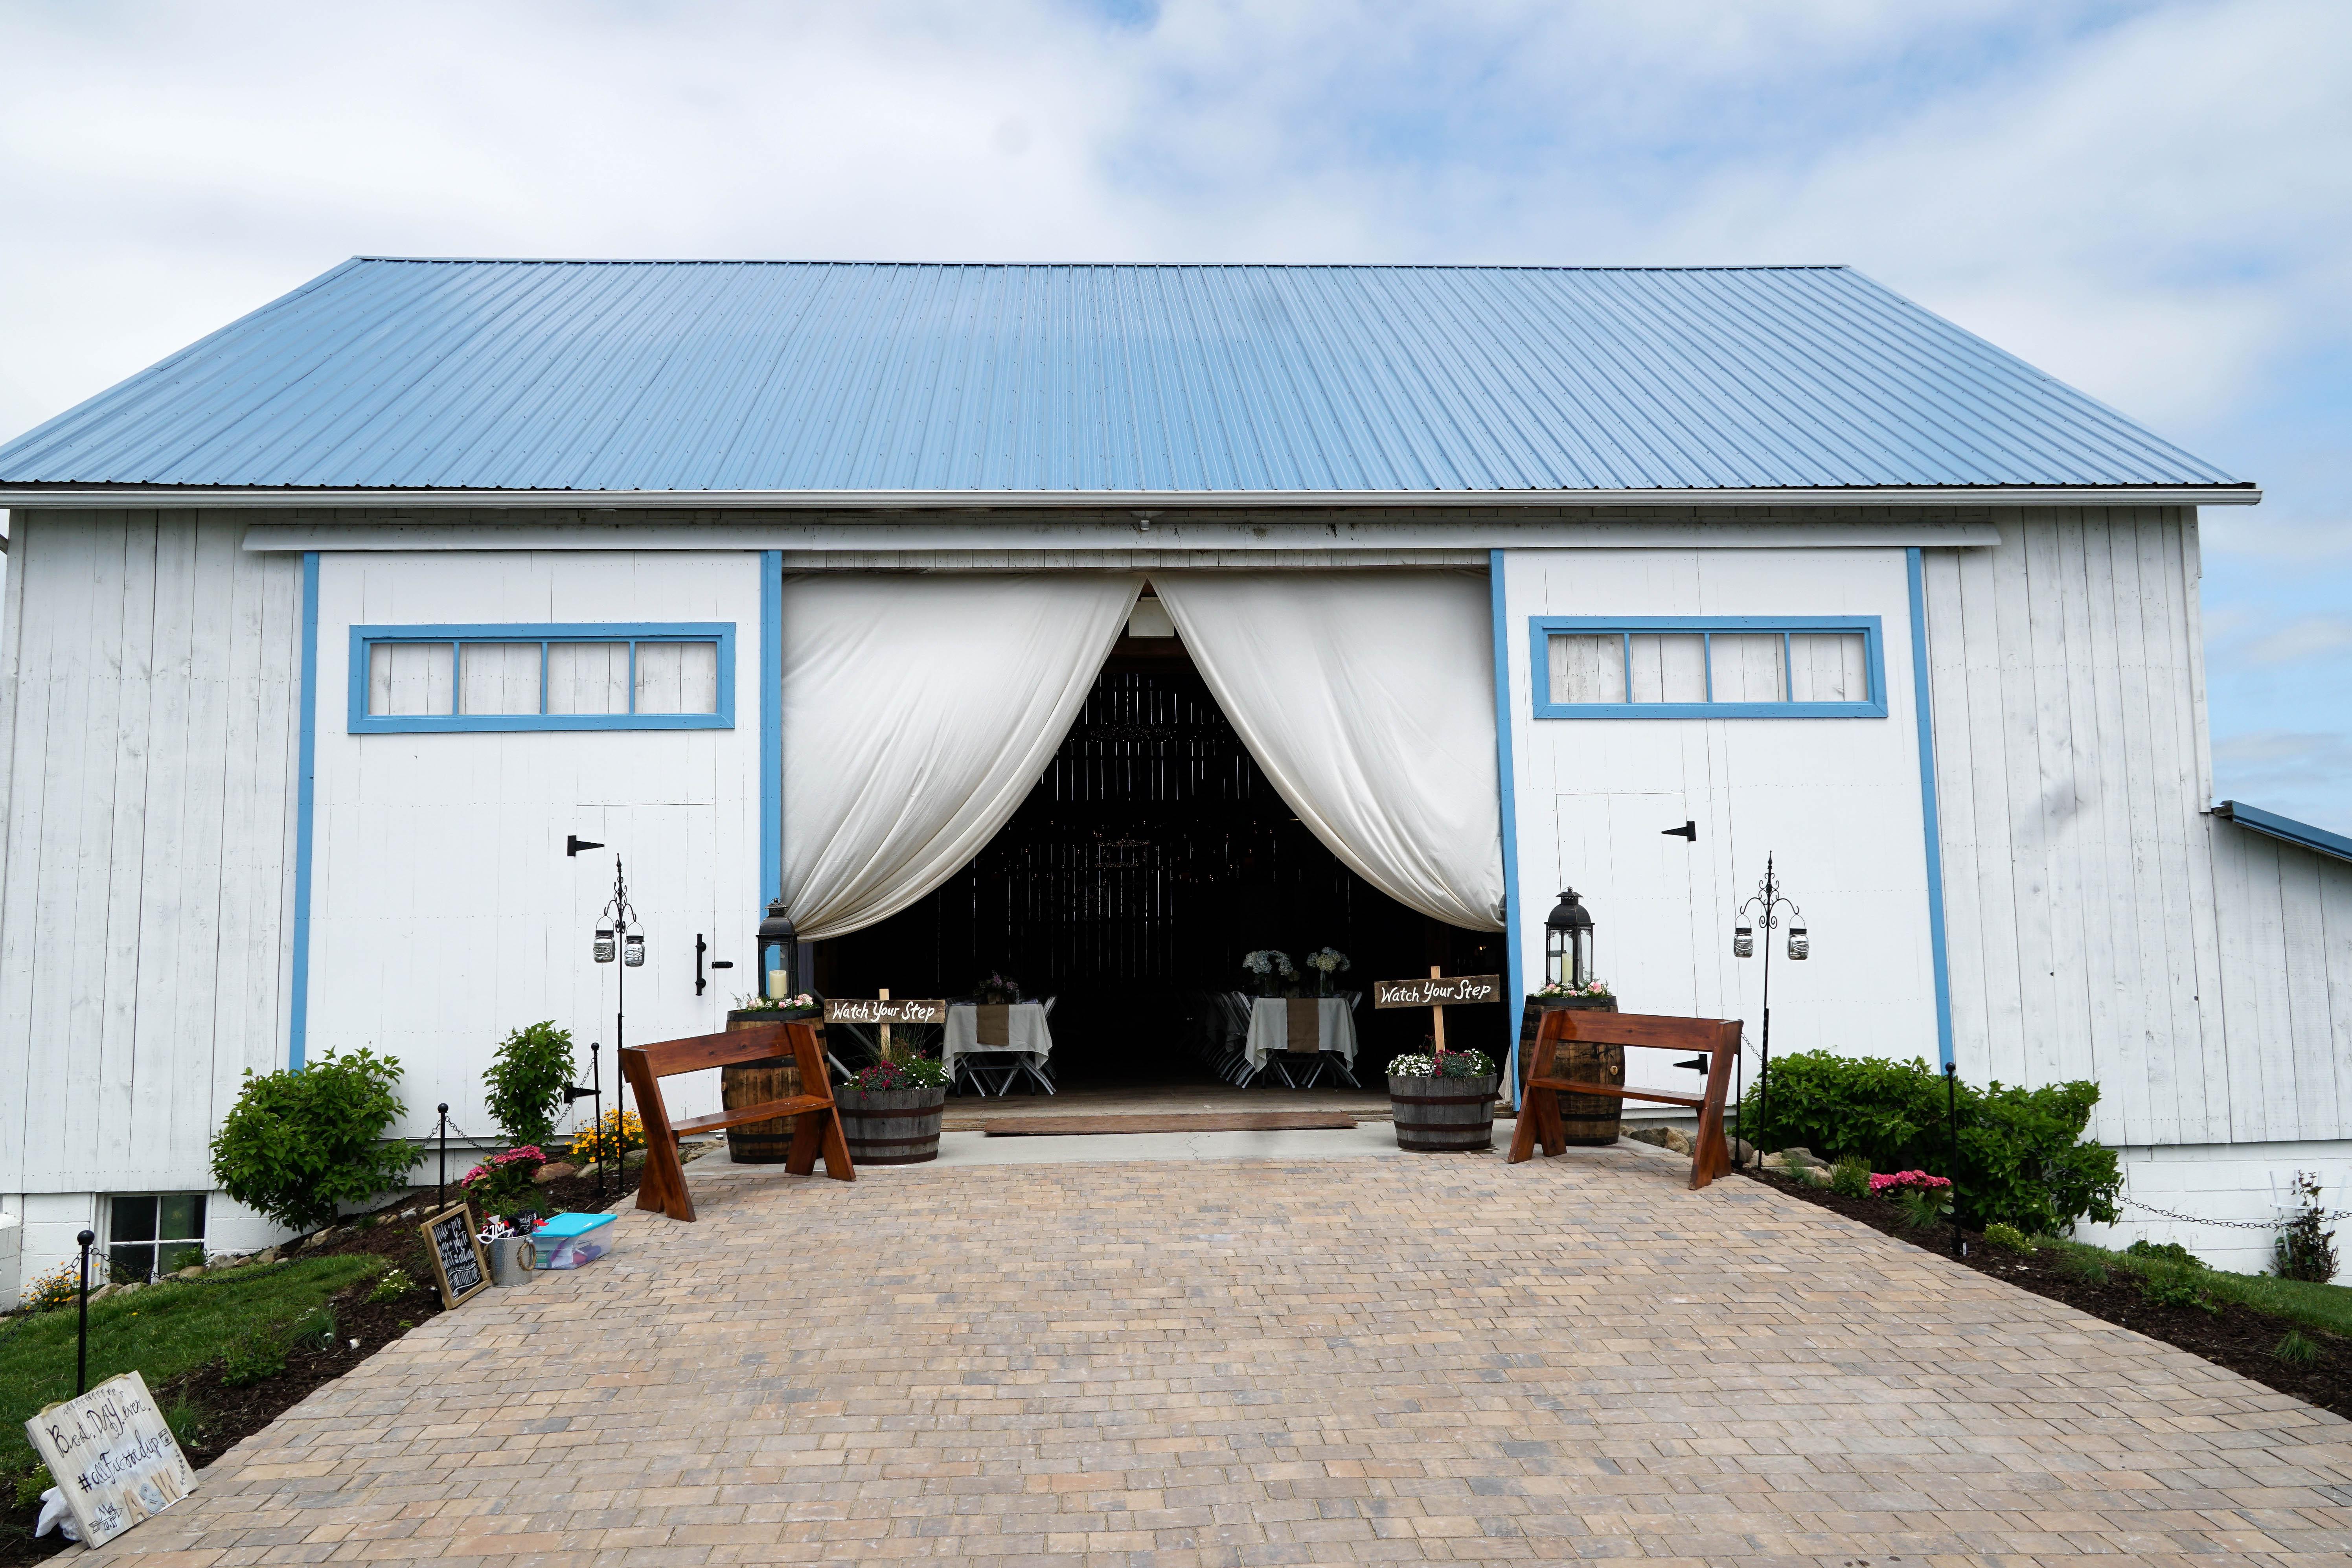 The wedding barn.